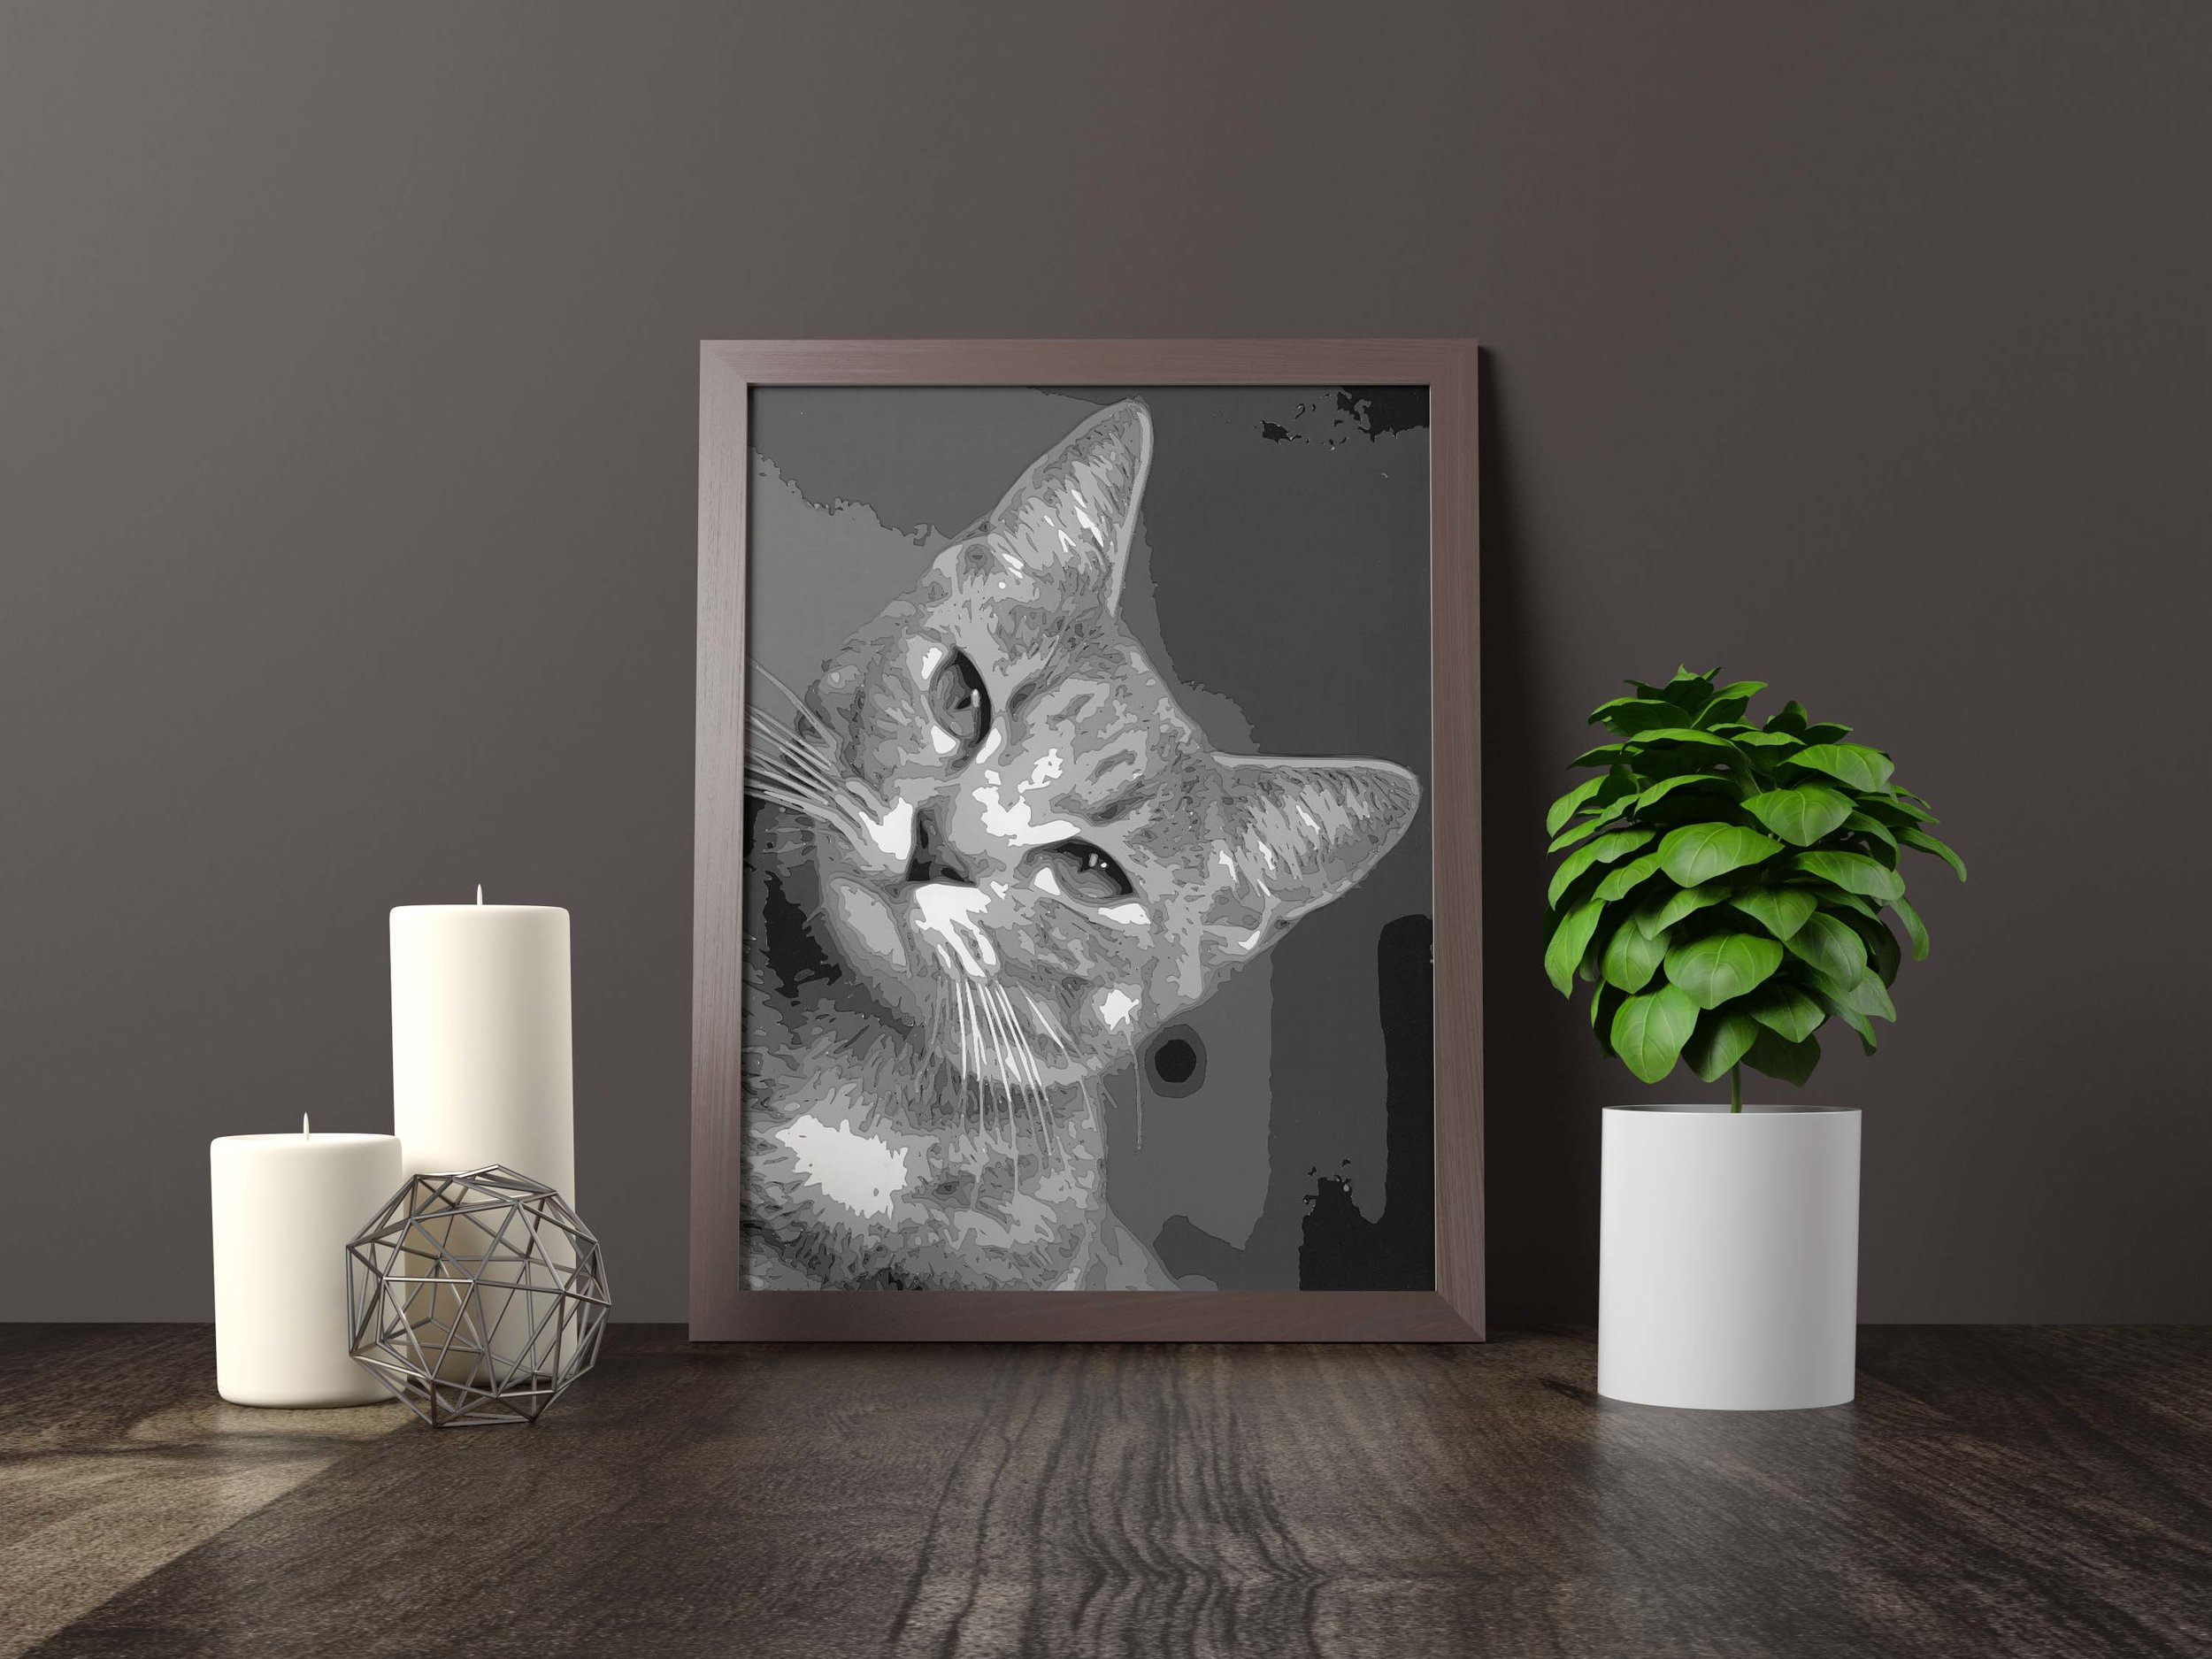 peeking cat - Original Artwork *SOLD* 11